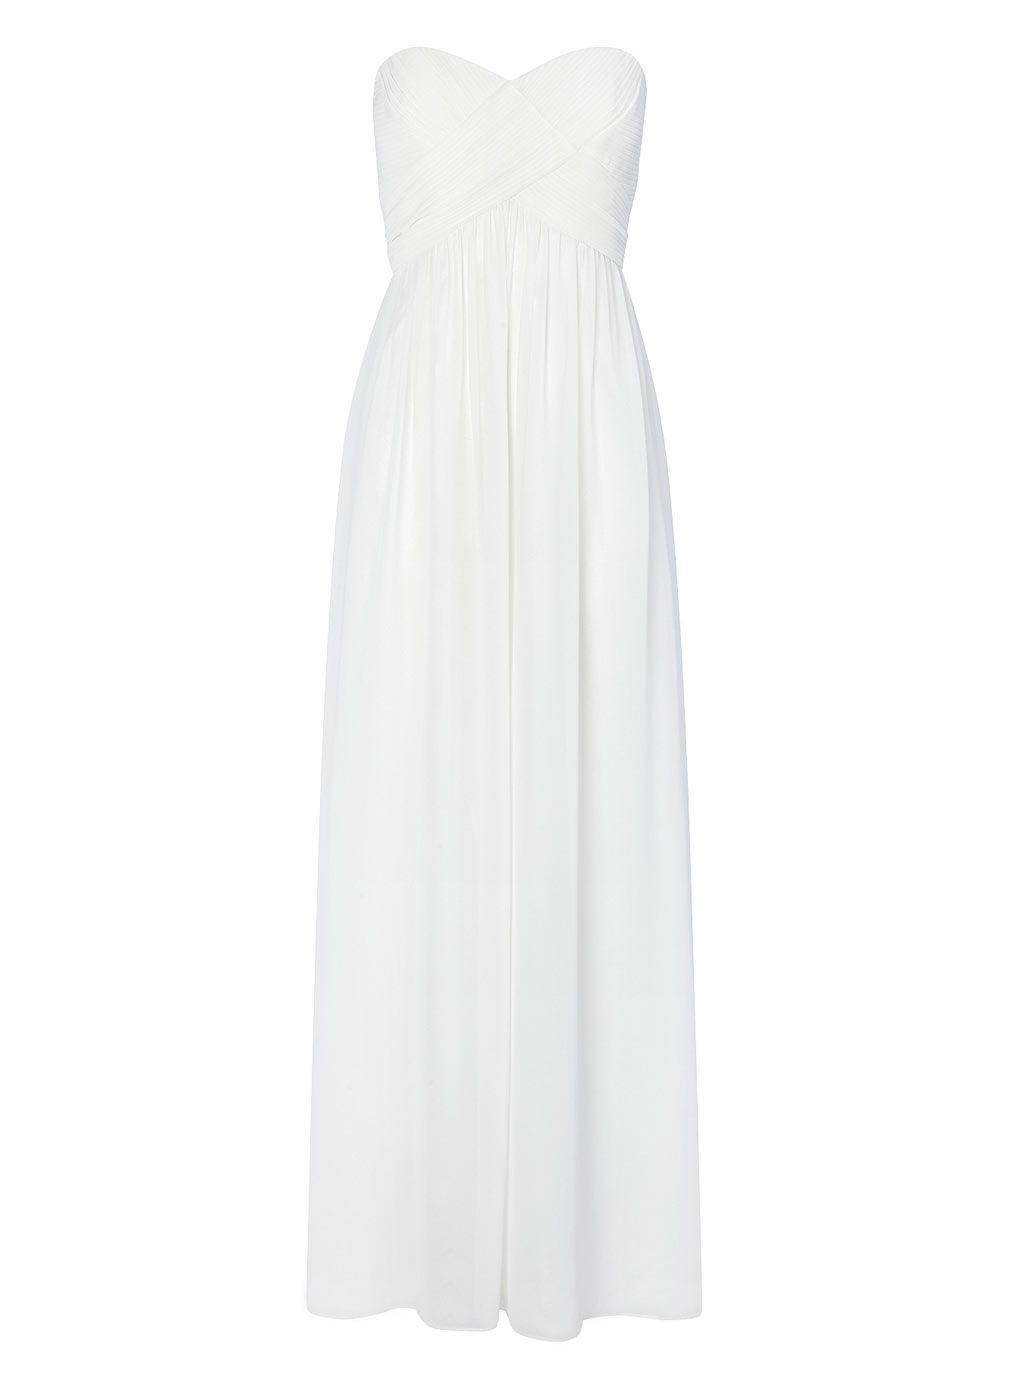 Darcy long bridal dress httpweddingheartbhs wedding darcy long bridal dress httpweddingheart ombrellifo Choice Image